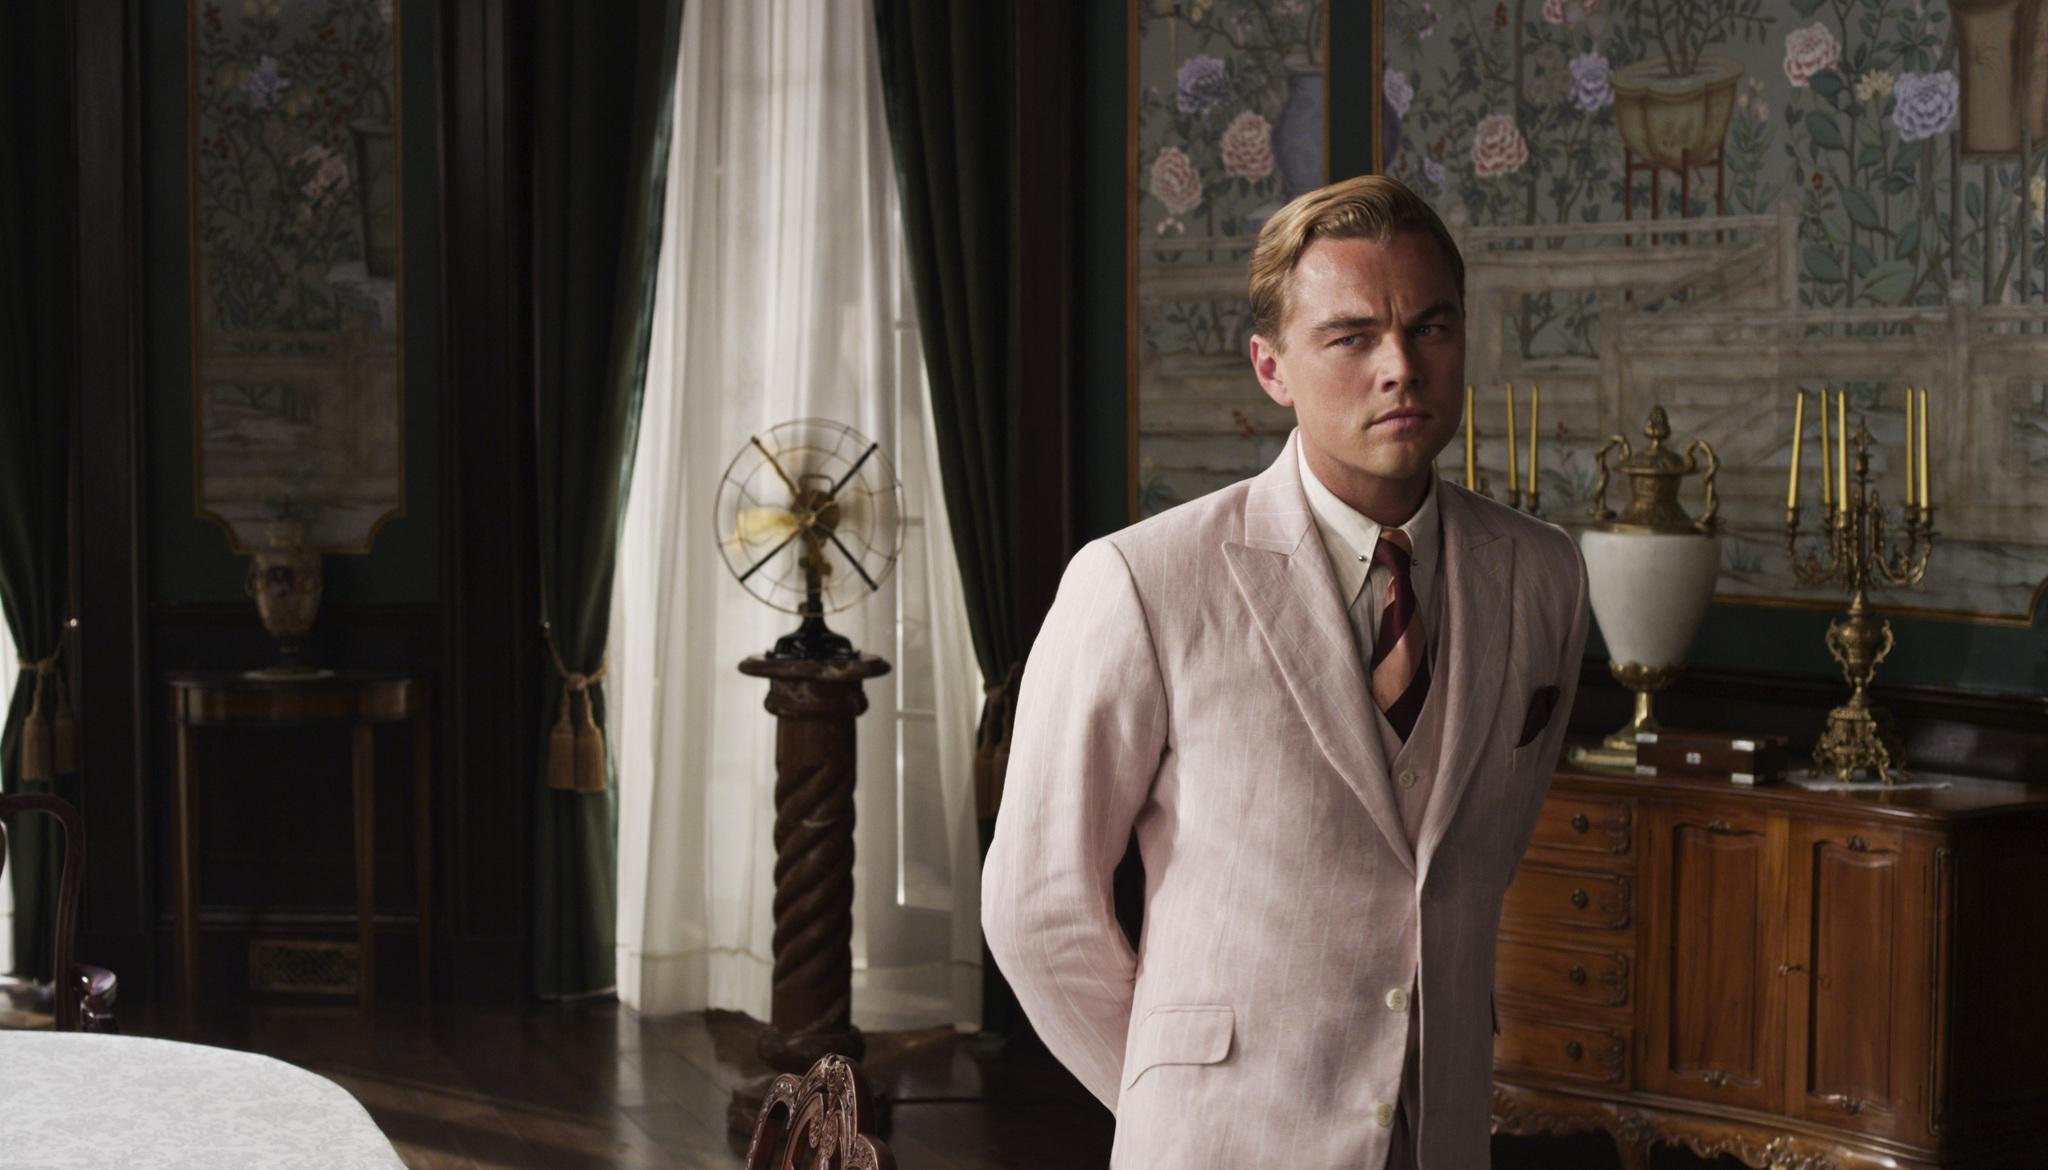 Love vs Class: The Great Gatsby